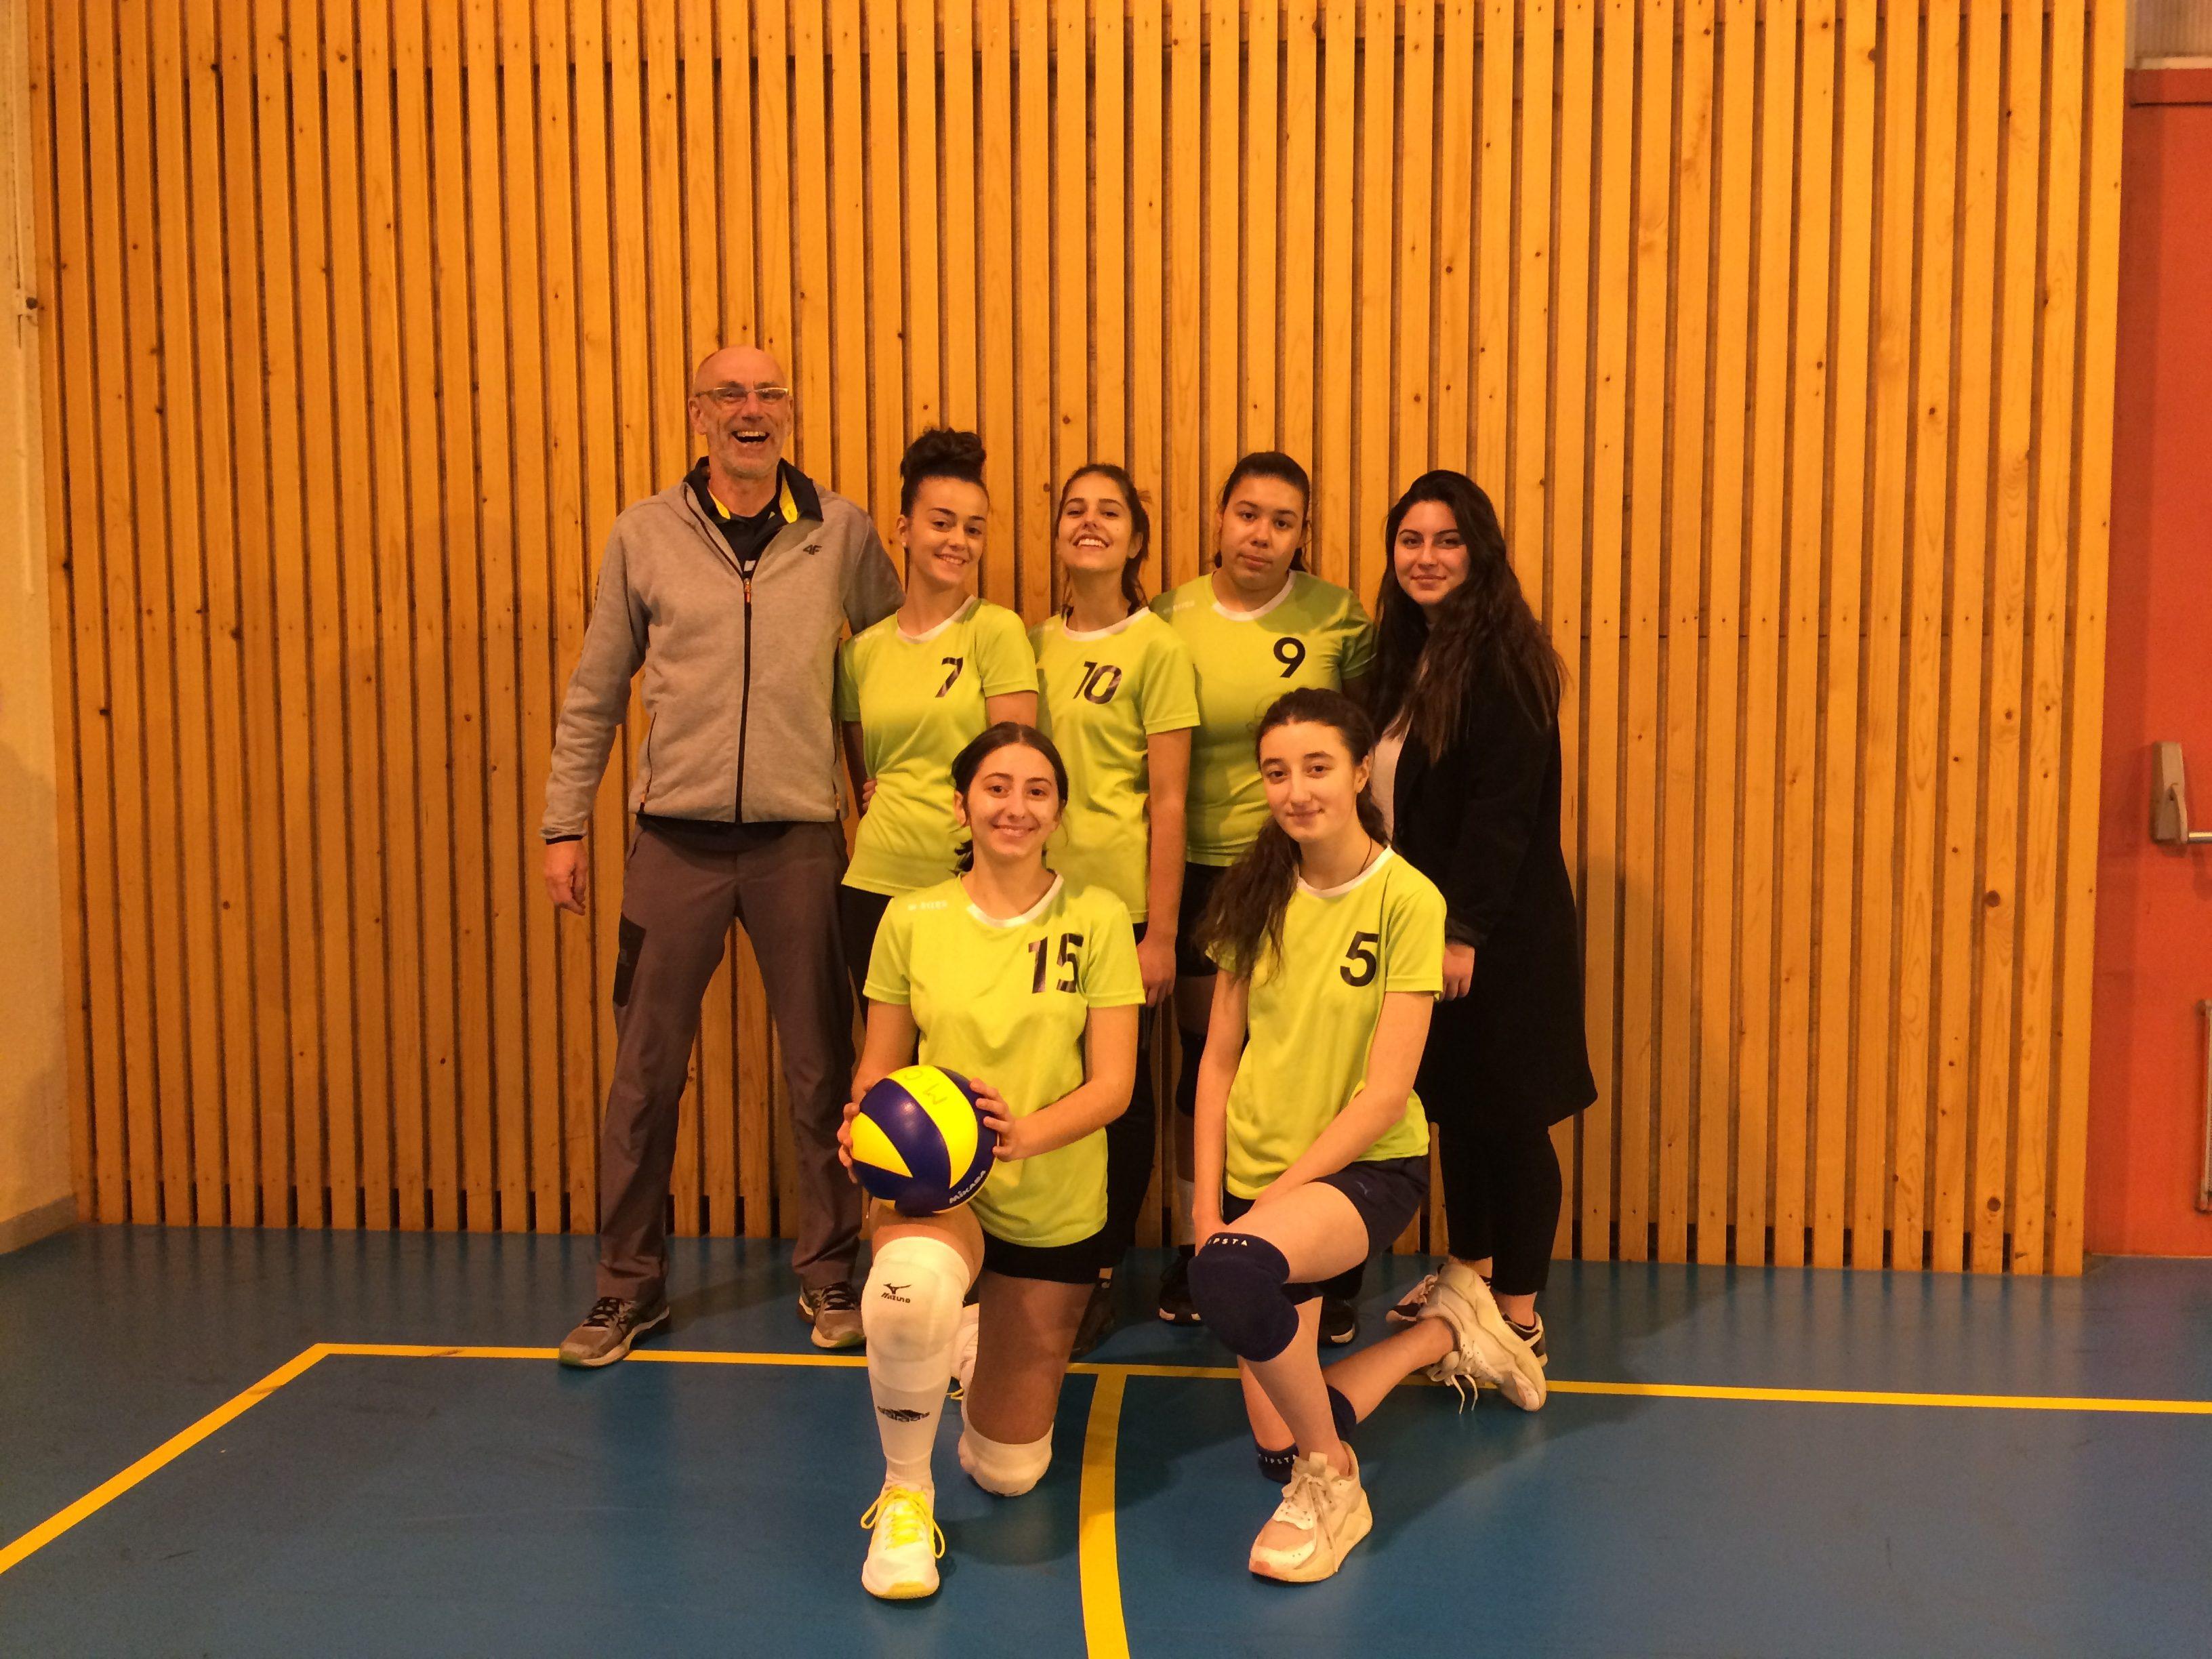 Laurie, Joana, Clara, Raziye (arbitre), Rukye et Maÿllis (2ASSP2)